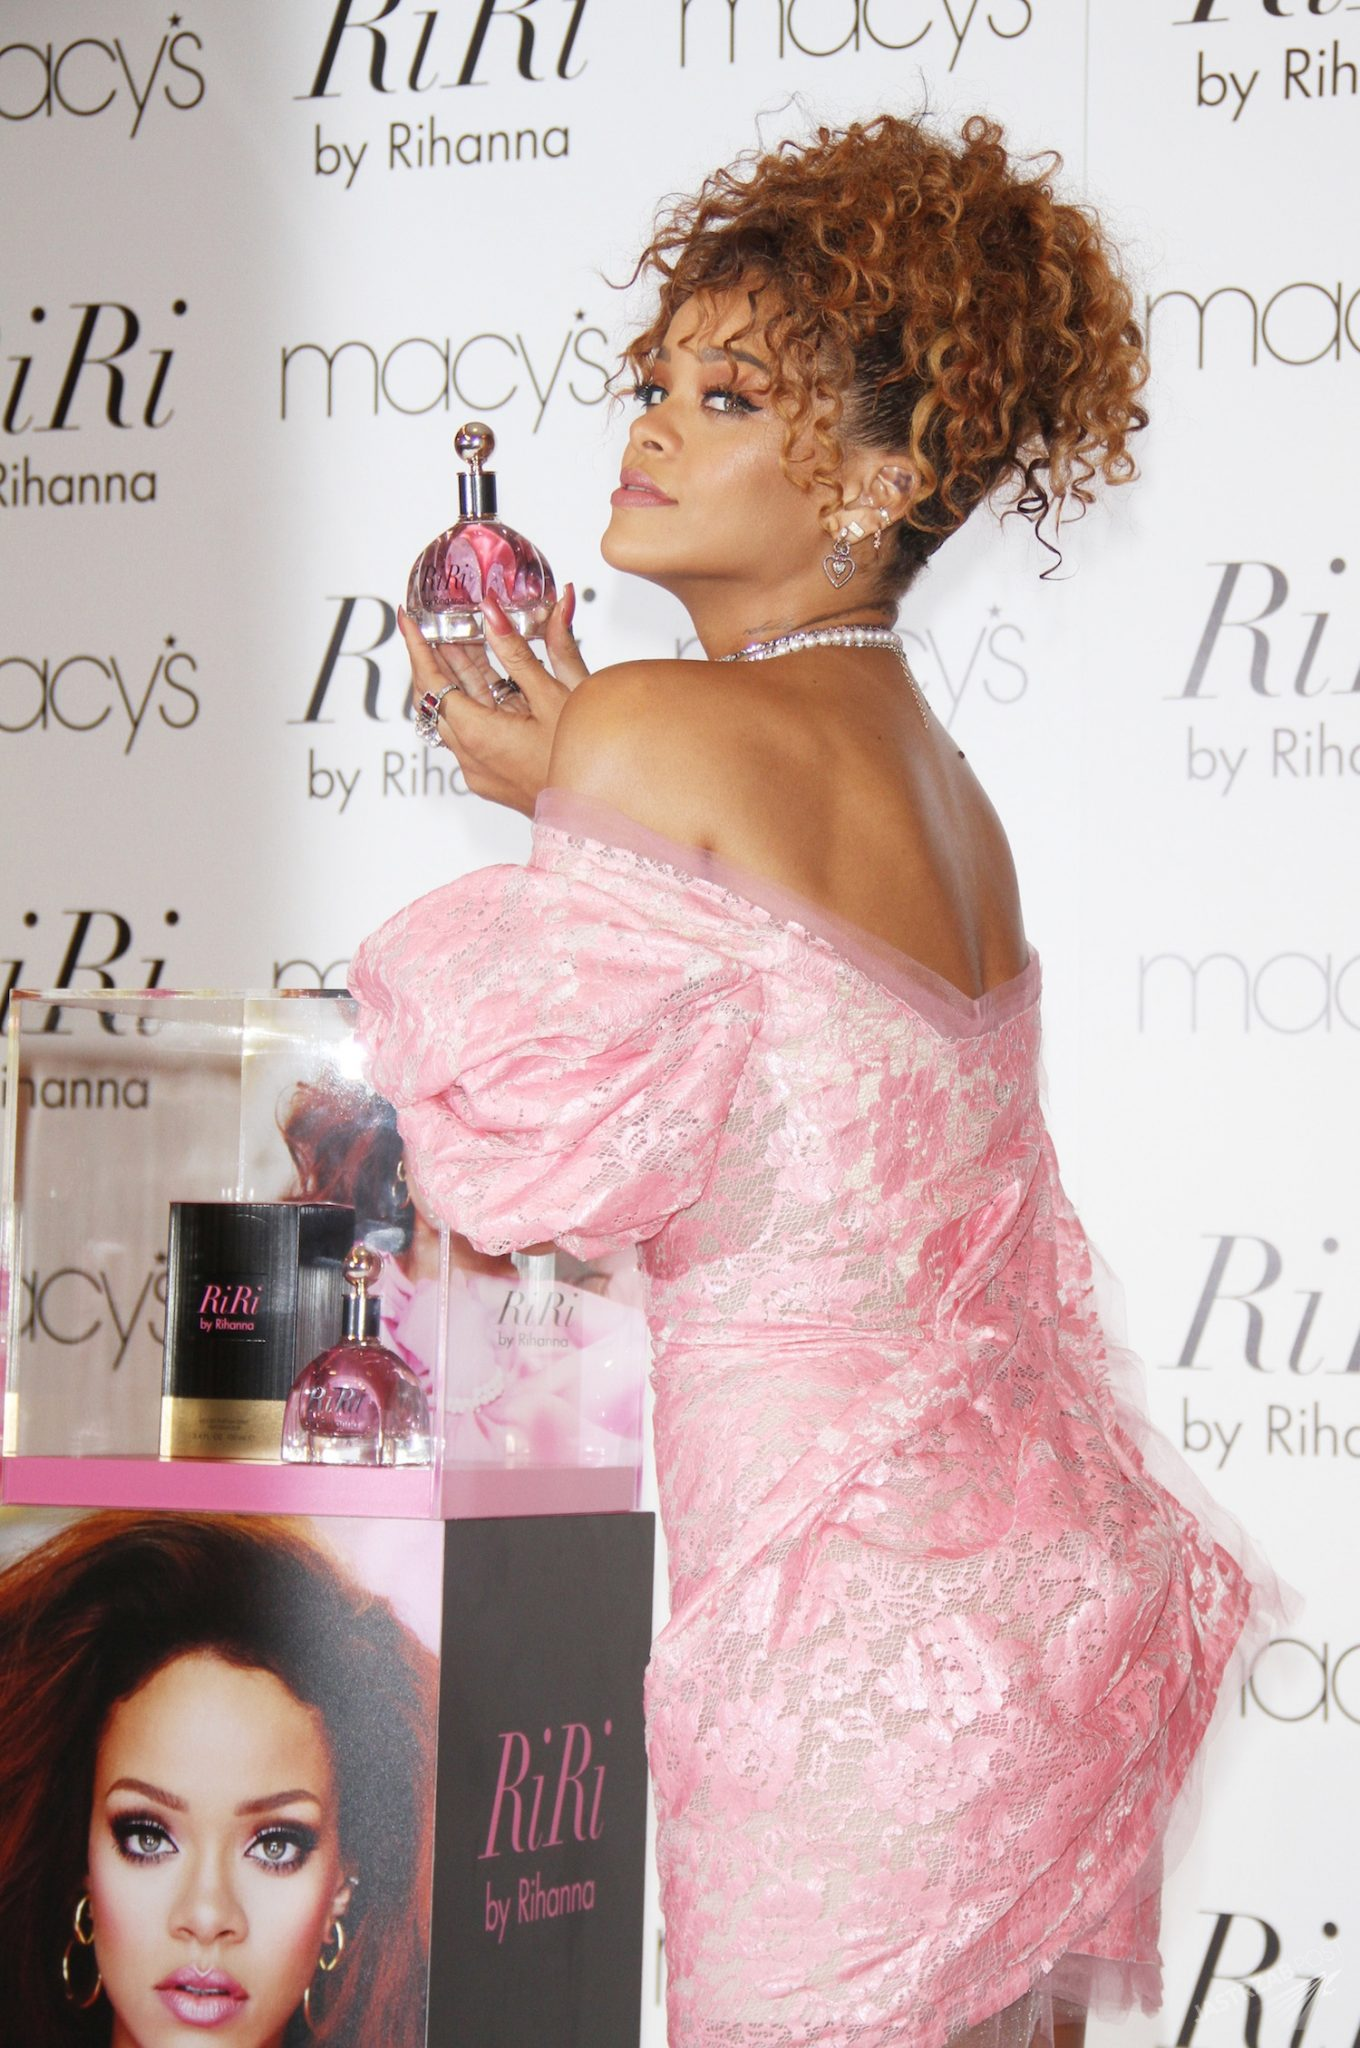 Rihanna ma nowe perfumy RiRi